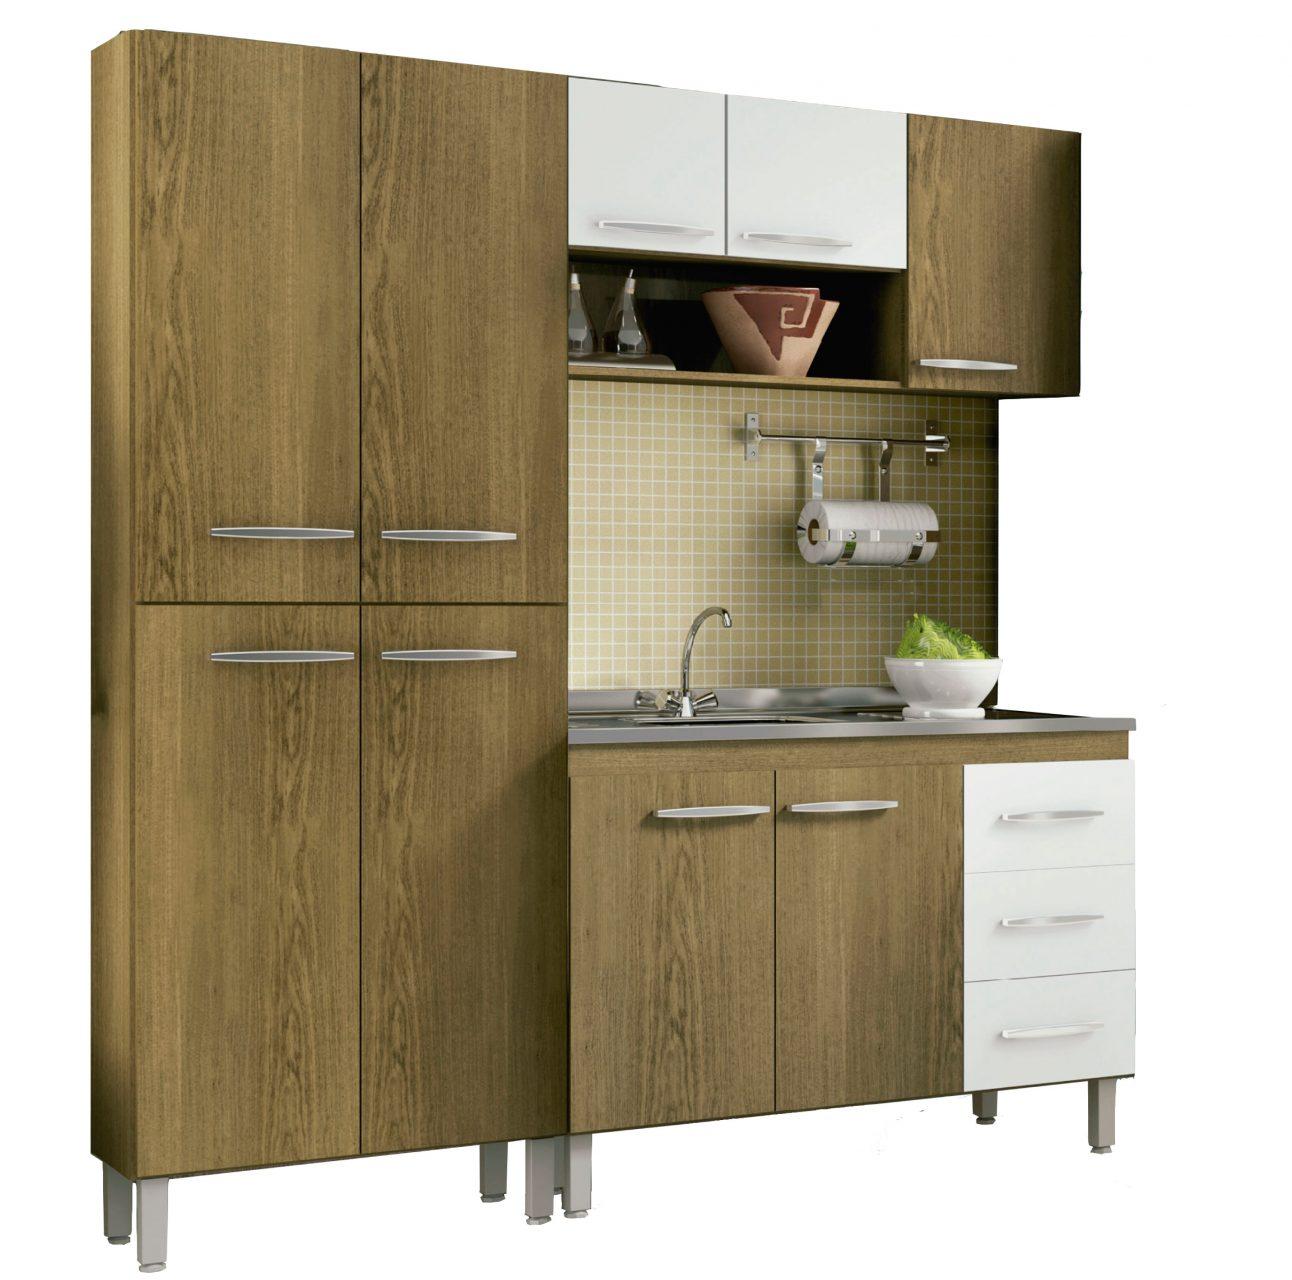 Muebles Cocina Bajo Mesada Aereo Kit Completo + Pileta 1.20